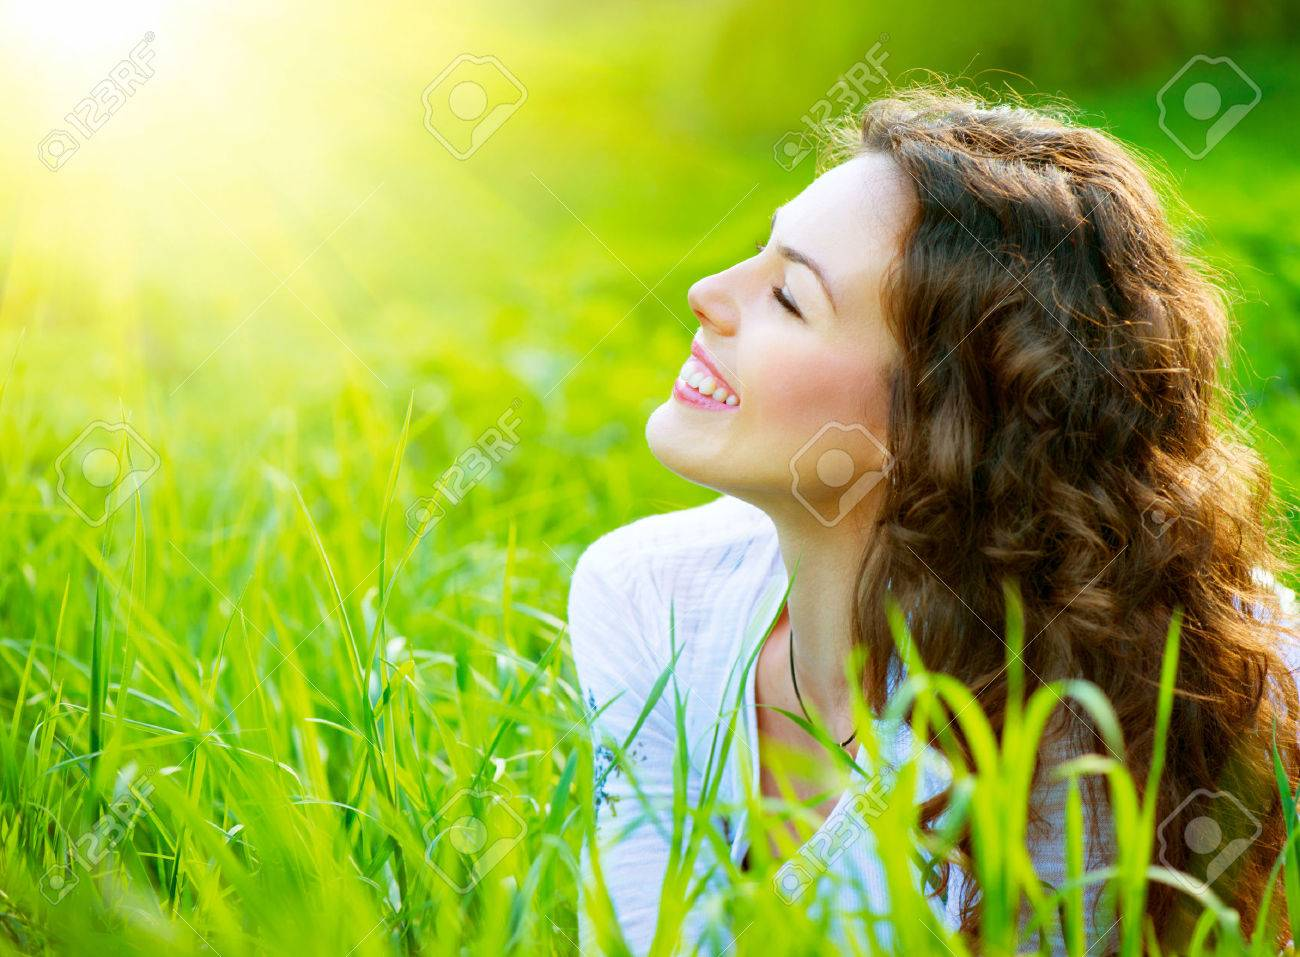 Beautiful Spring Young Woman Outdoors Enjoying Nature - 25594201